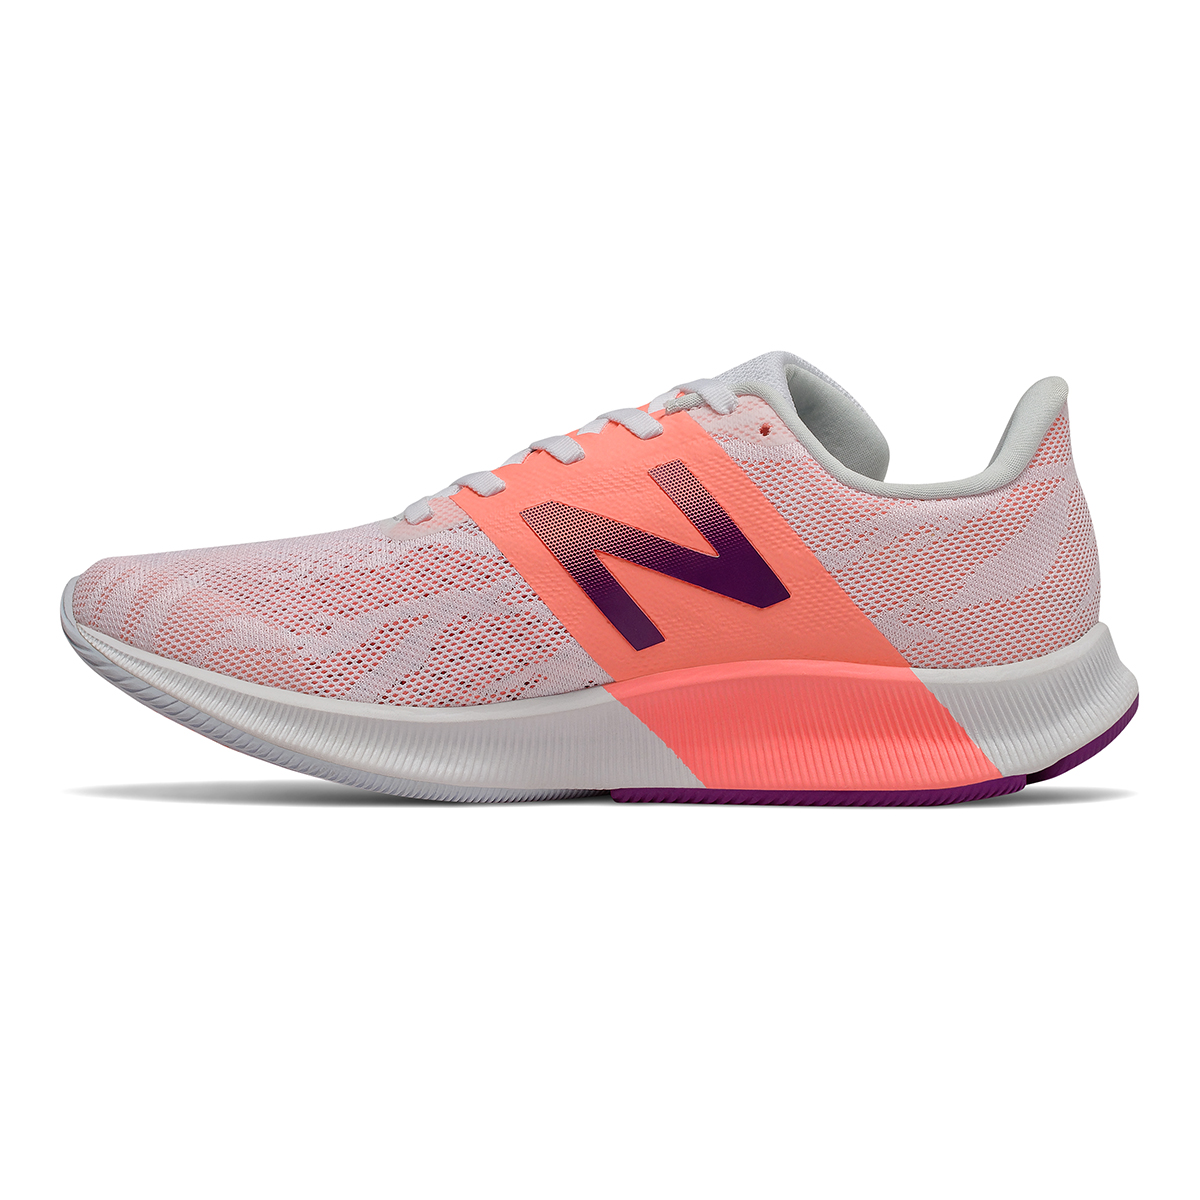 Women's New Balance 890V8 Running Shoe - Color: Moondust (Regular Width) - Size: 5, Moondust, large, image 2